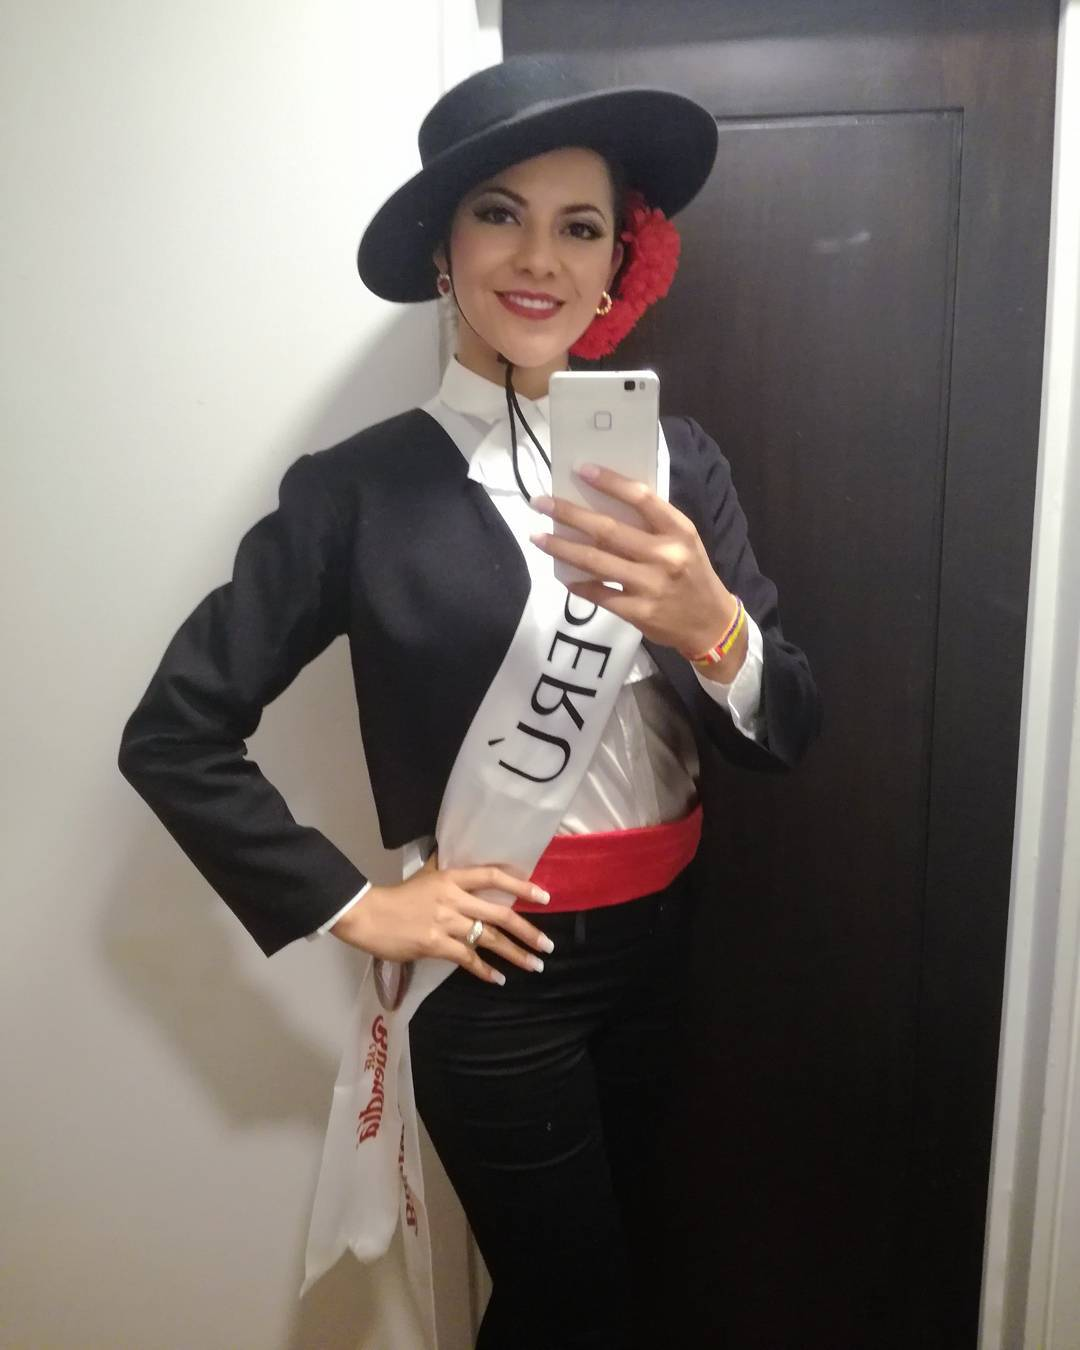 gabriela lambruschini, miss peru reyna internacional cafe 2018. - Página 4 26226610